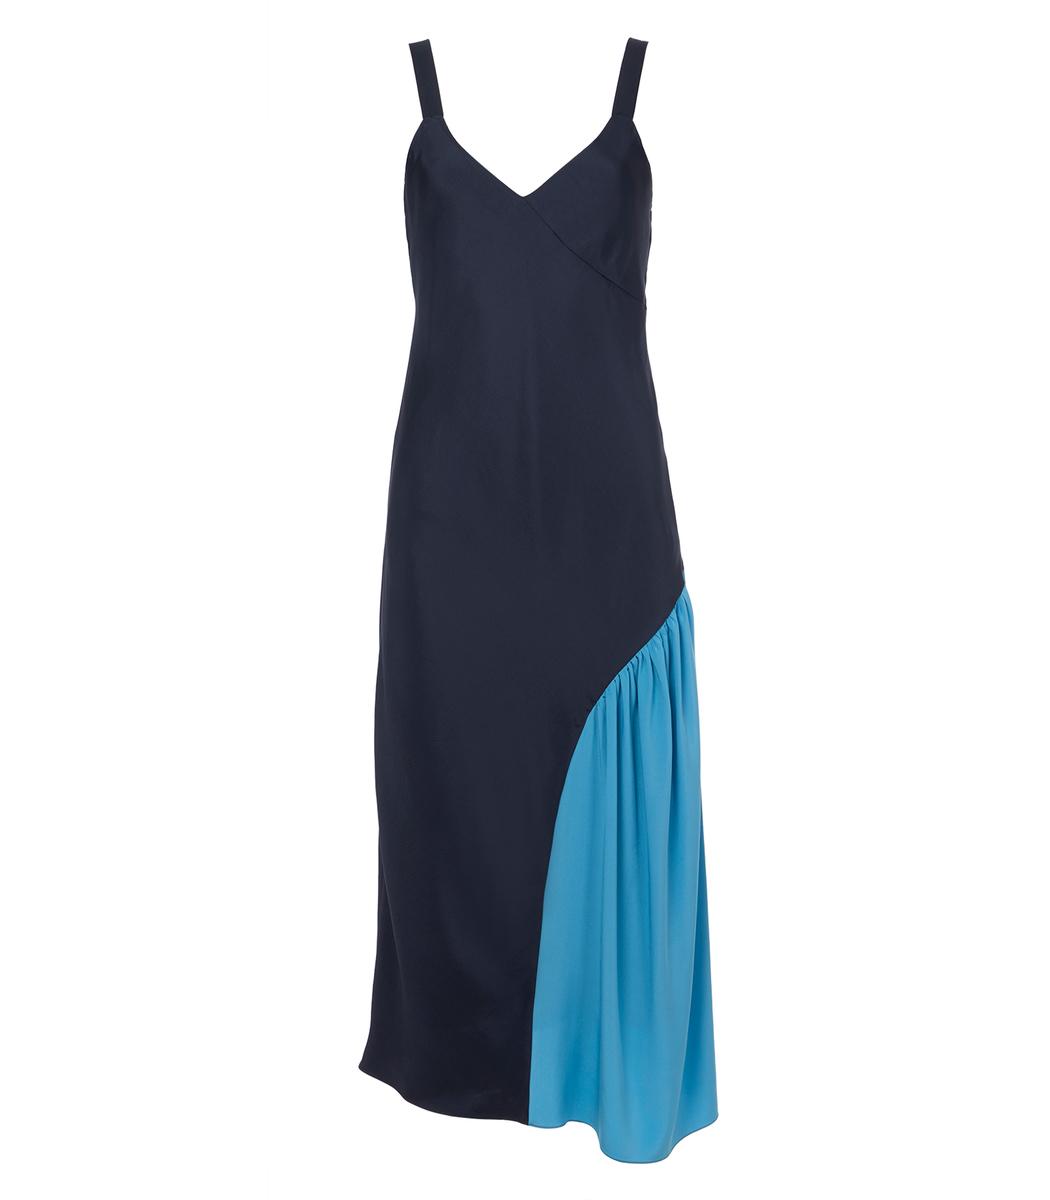 Tibi Woman Draped Satin Slip Dress Navy Size 12 Tibi Spq1U18